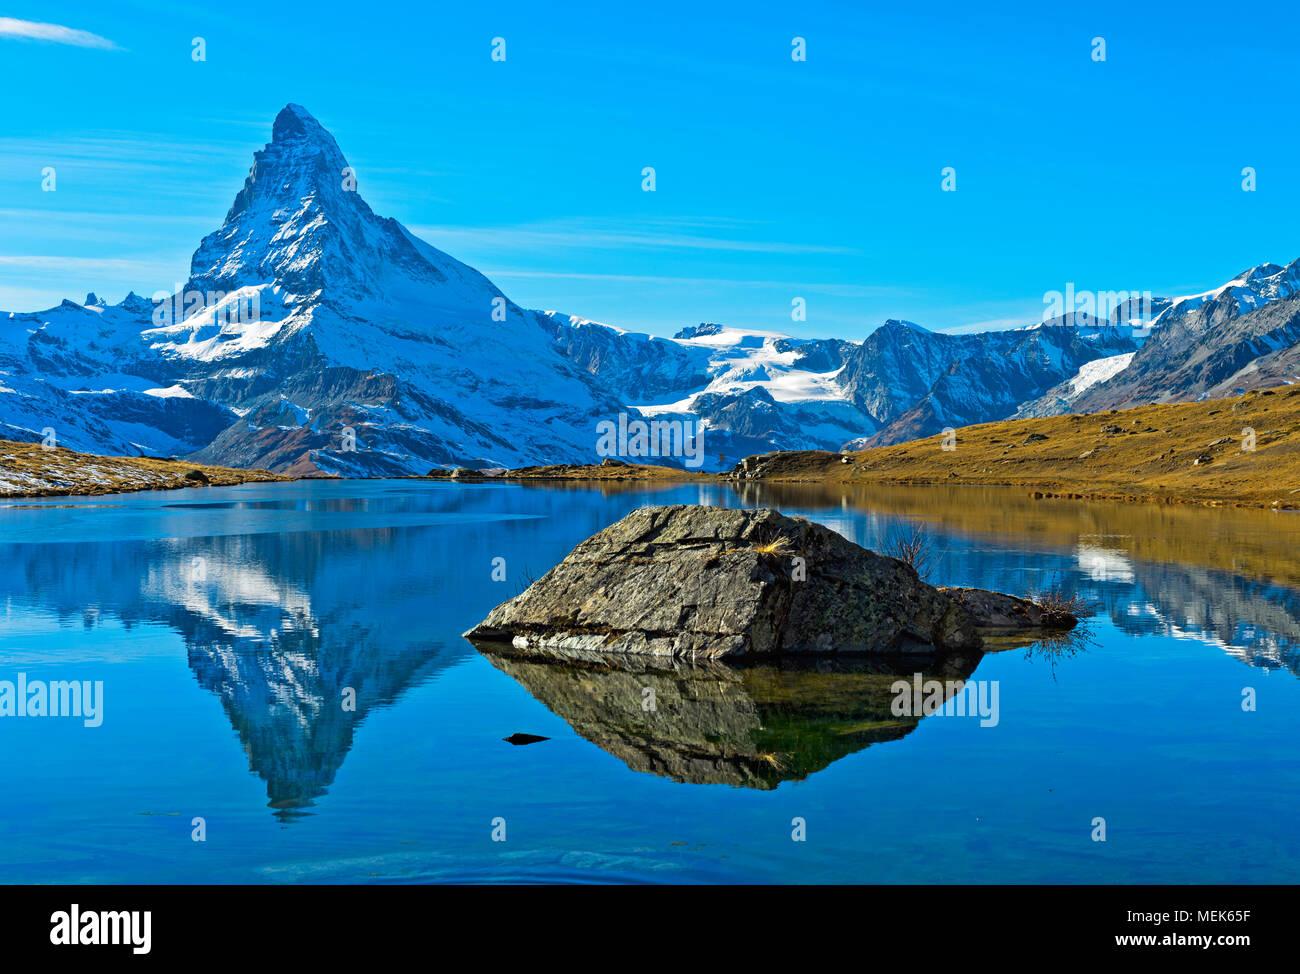 El Matterhorn, Mont Cervin, se refleja en el lago Stellisee, Zermatt, Valais, Suiza Foto de stock